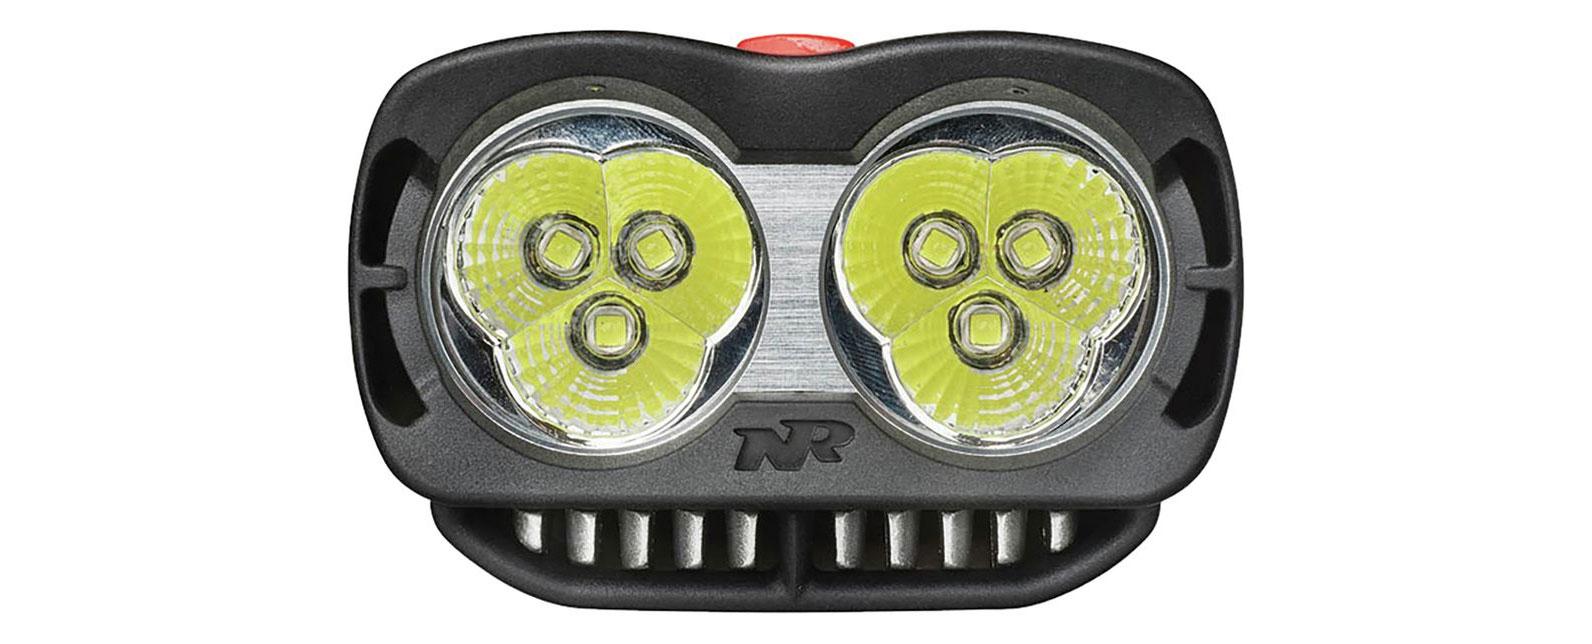 Best Mountain Bike Lights: Nite Rider 4200